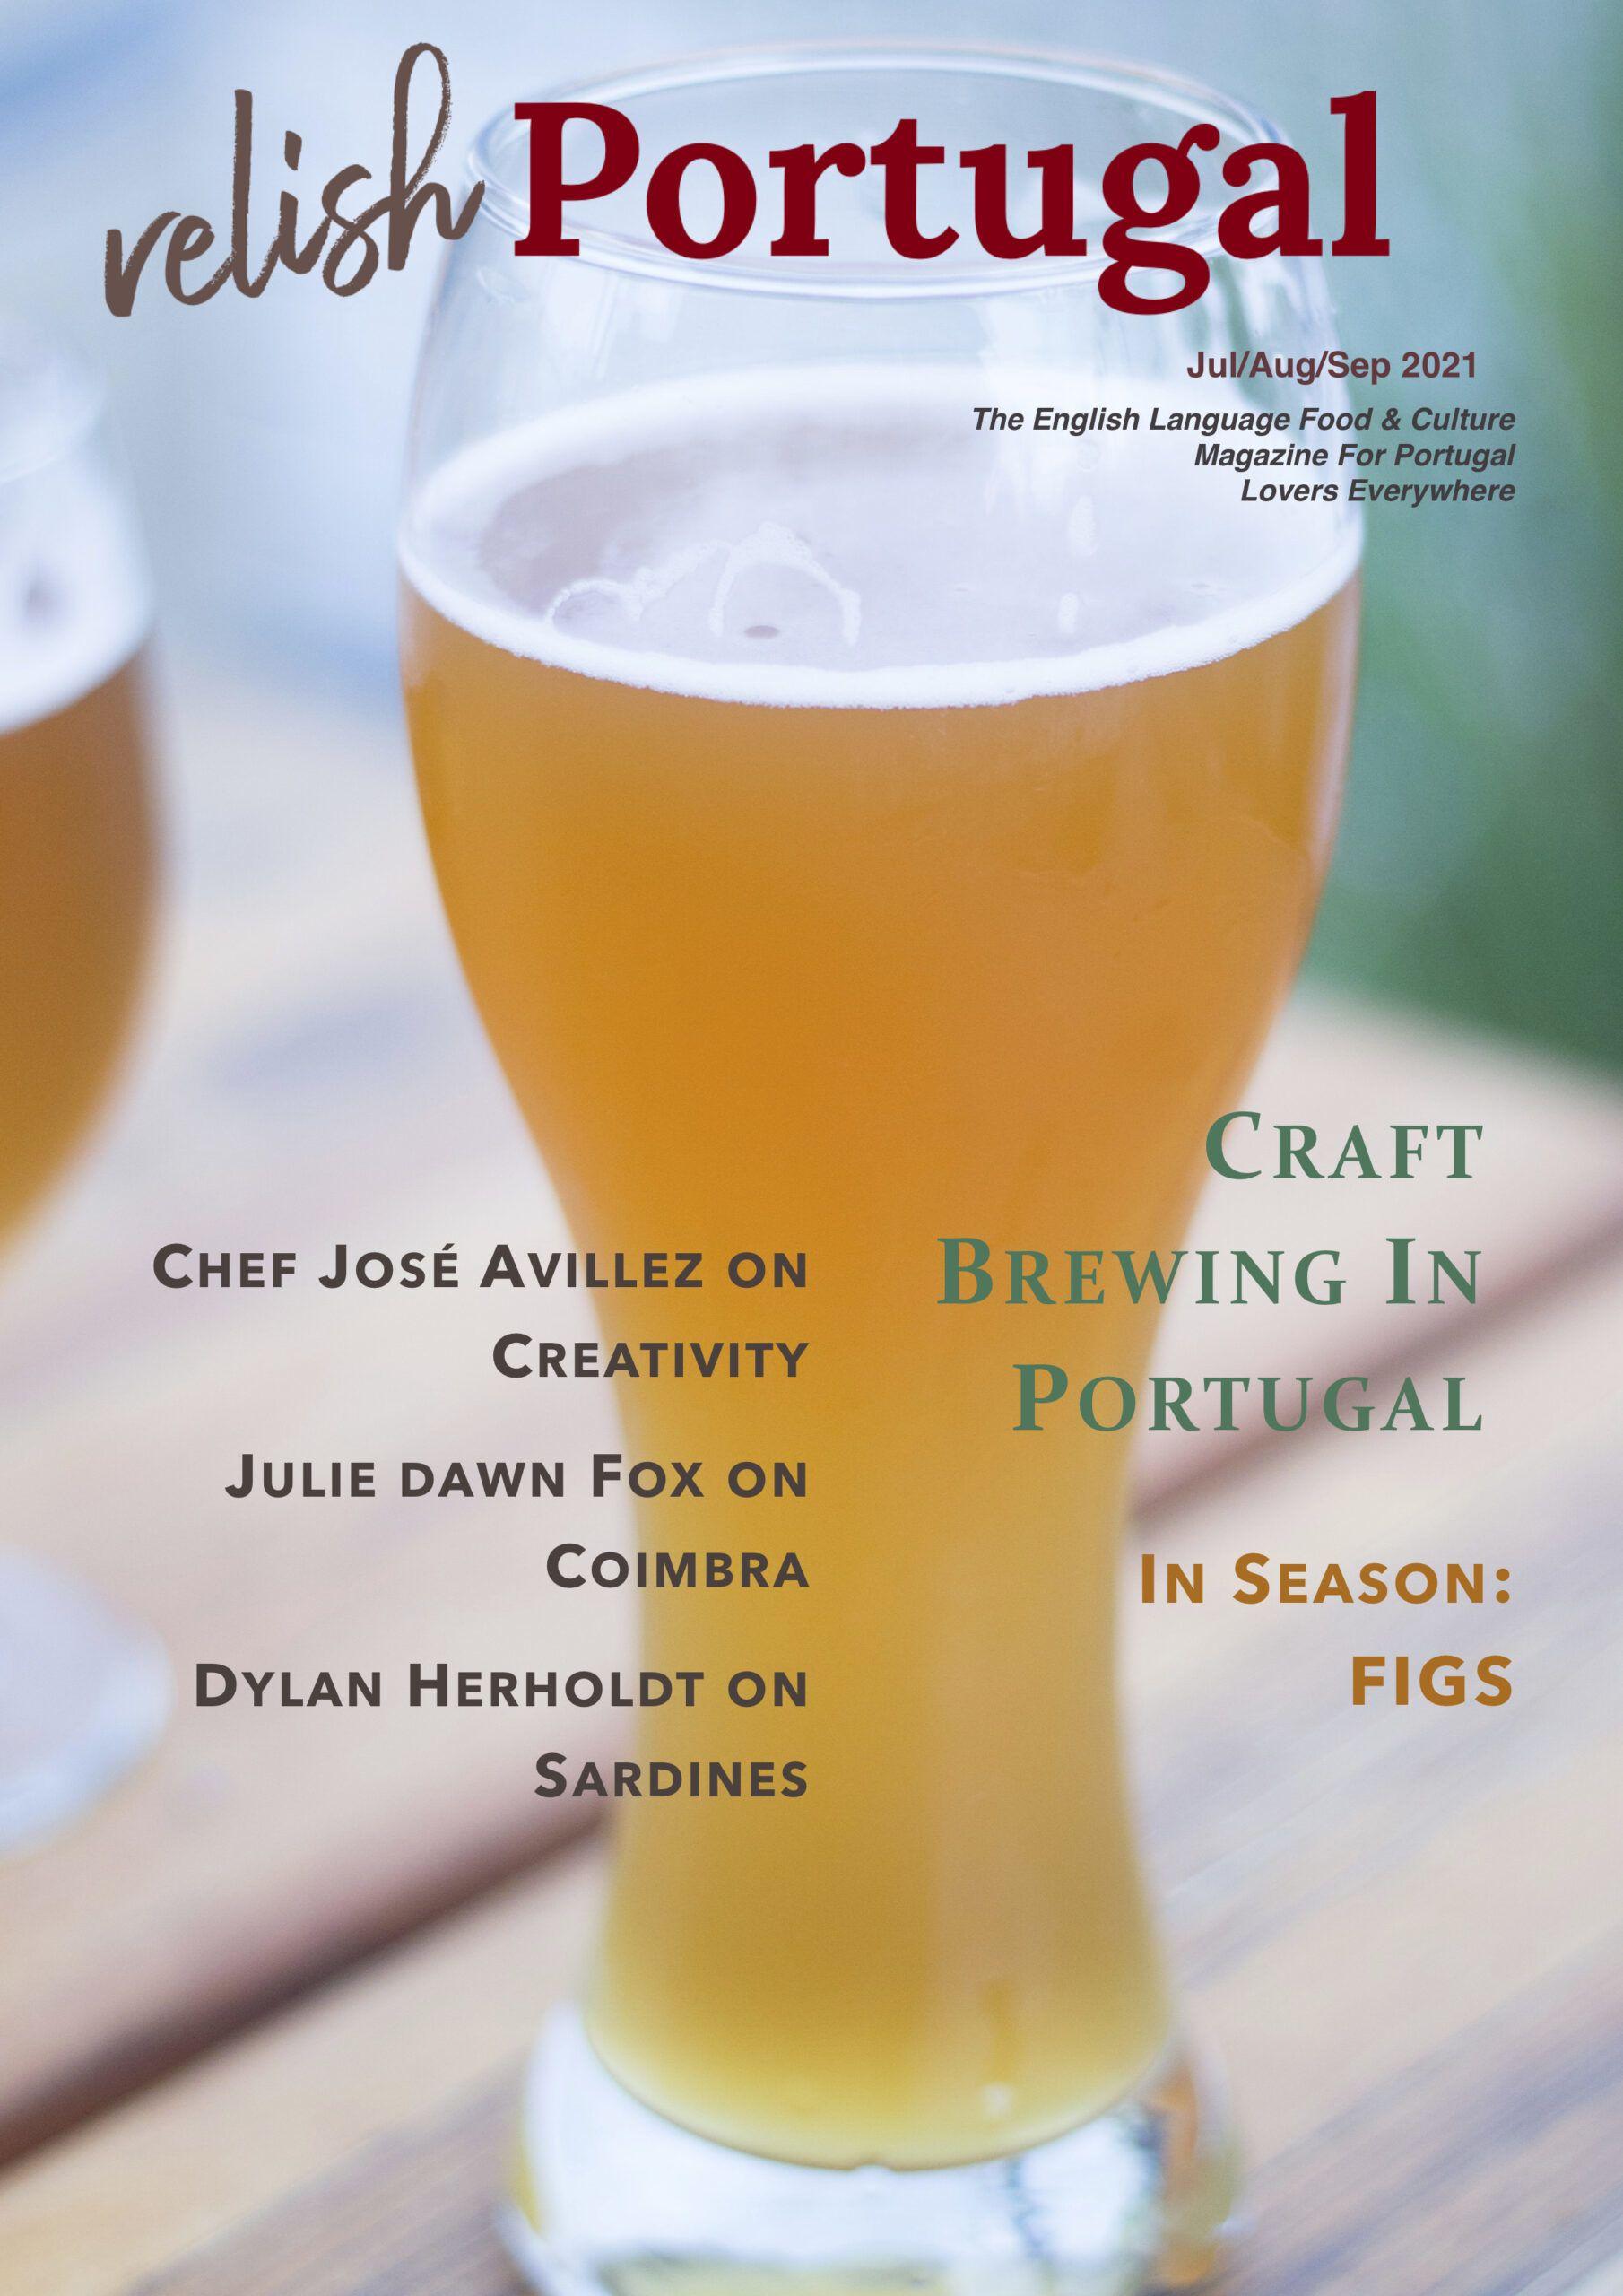 Relish Portugal Jul/Aug/Sep 2021 Cover